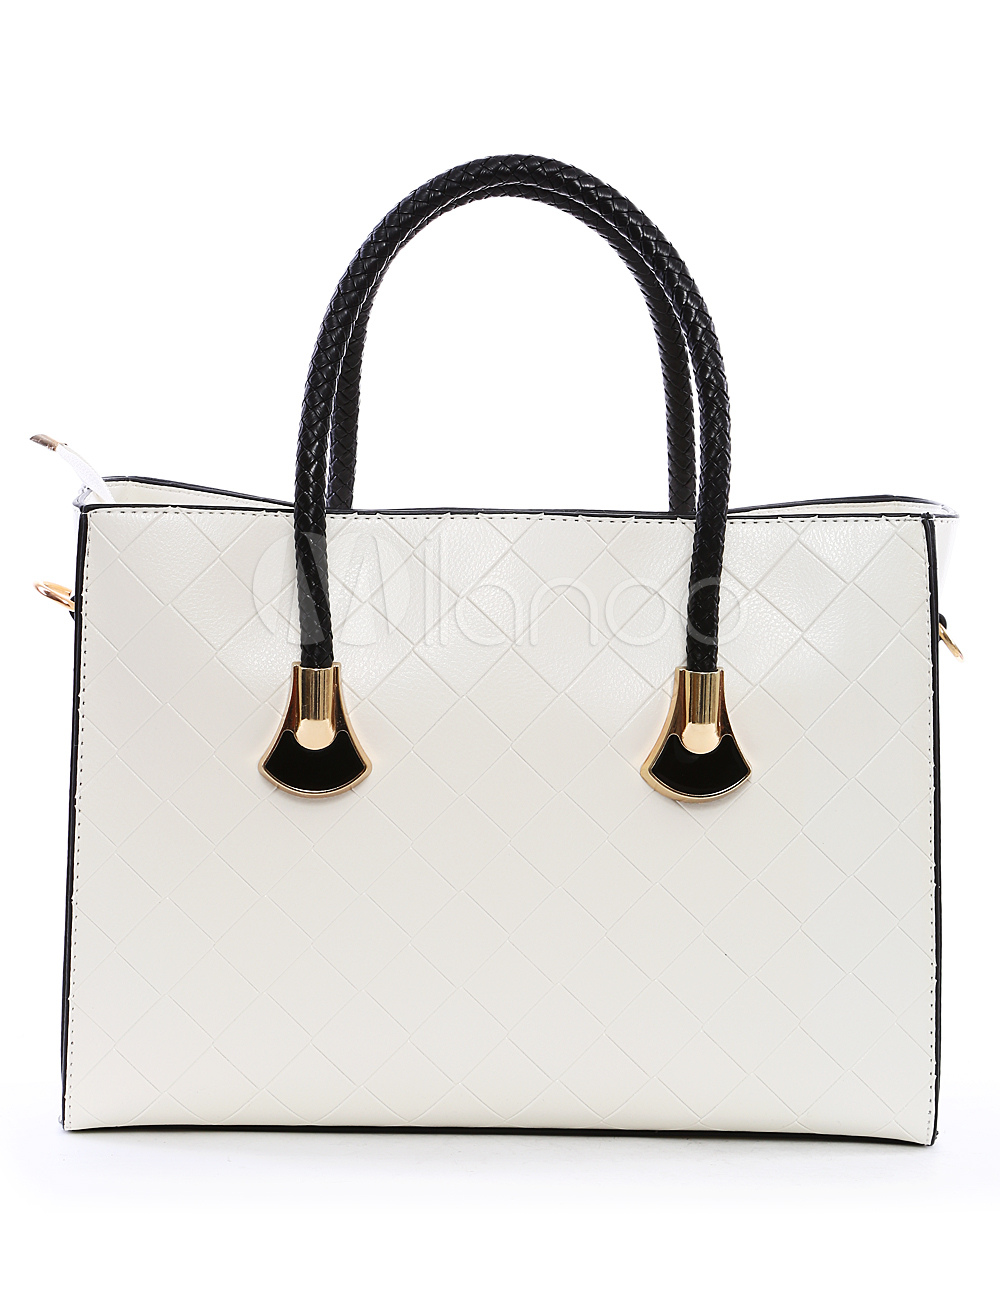 PU Leather Elegant Women's Tote Bag